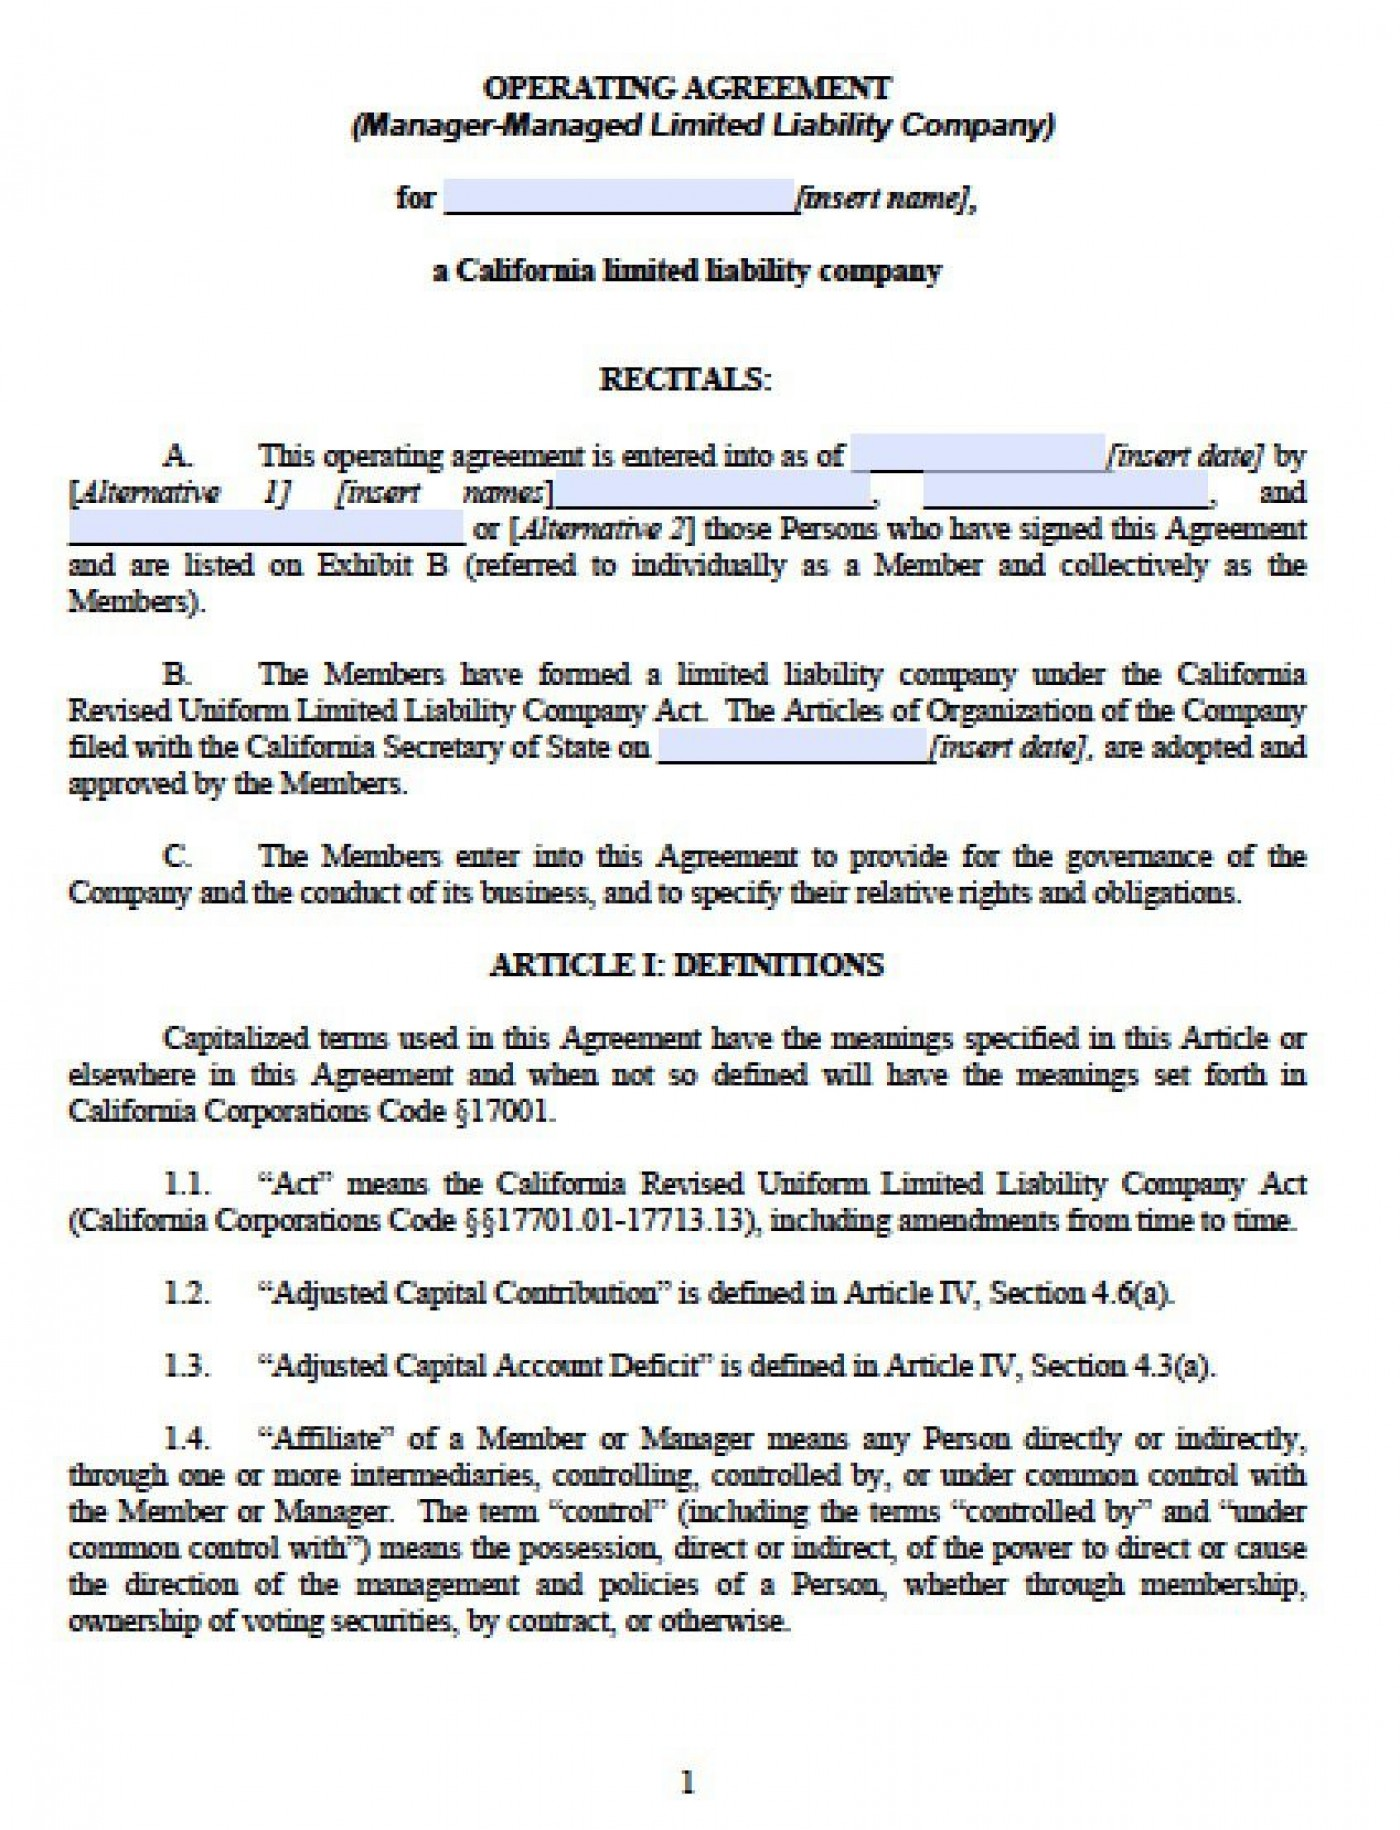 002 Unique Operation Agreement Llc Template Design  Operating Florida Indiana Single Member California1400